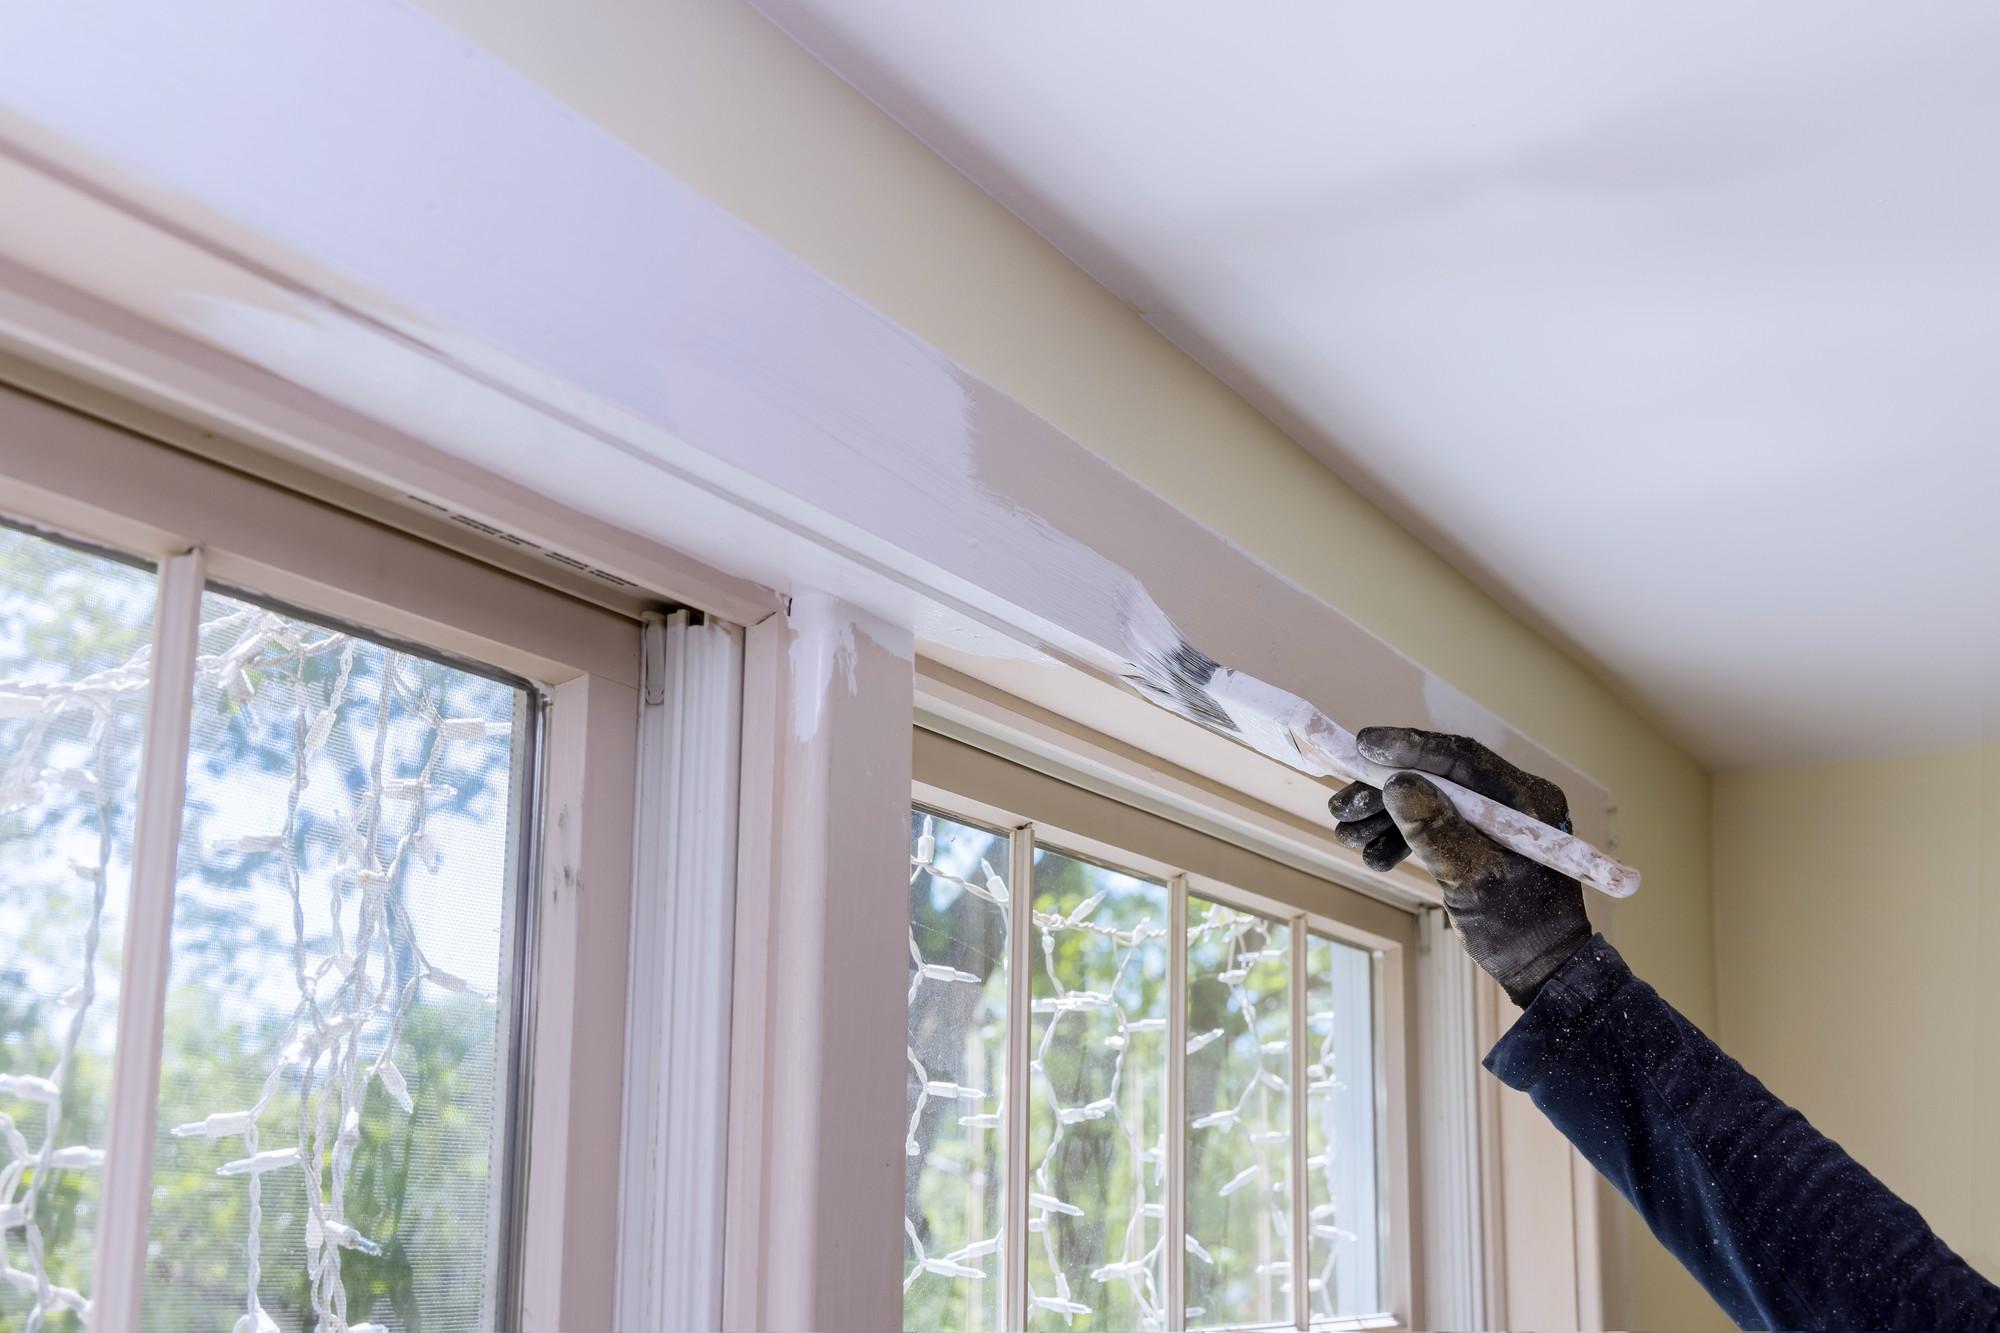 hand painting window panes